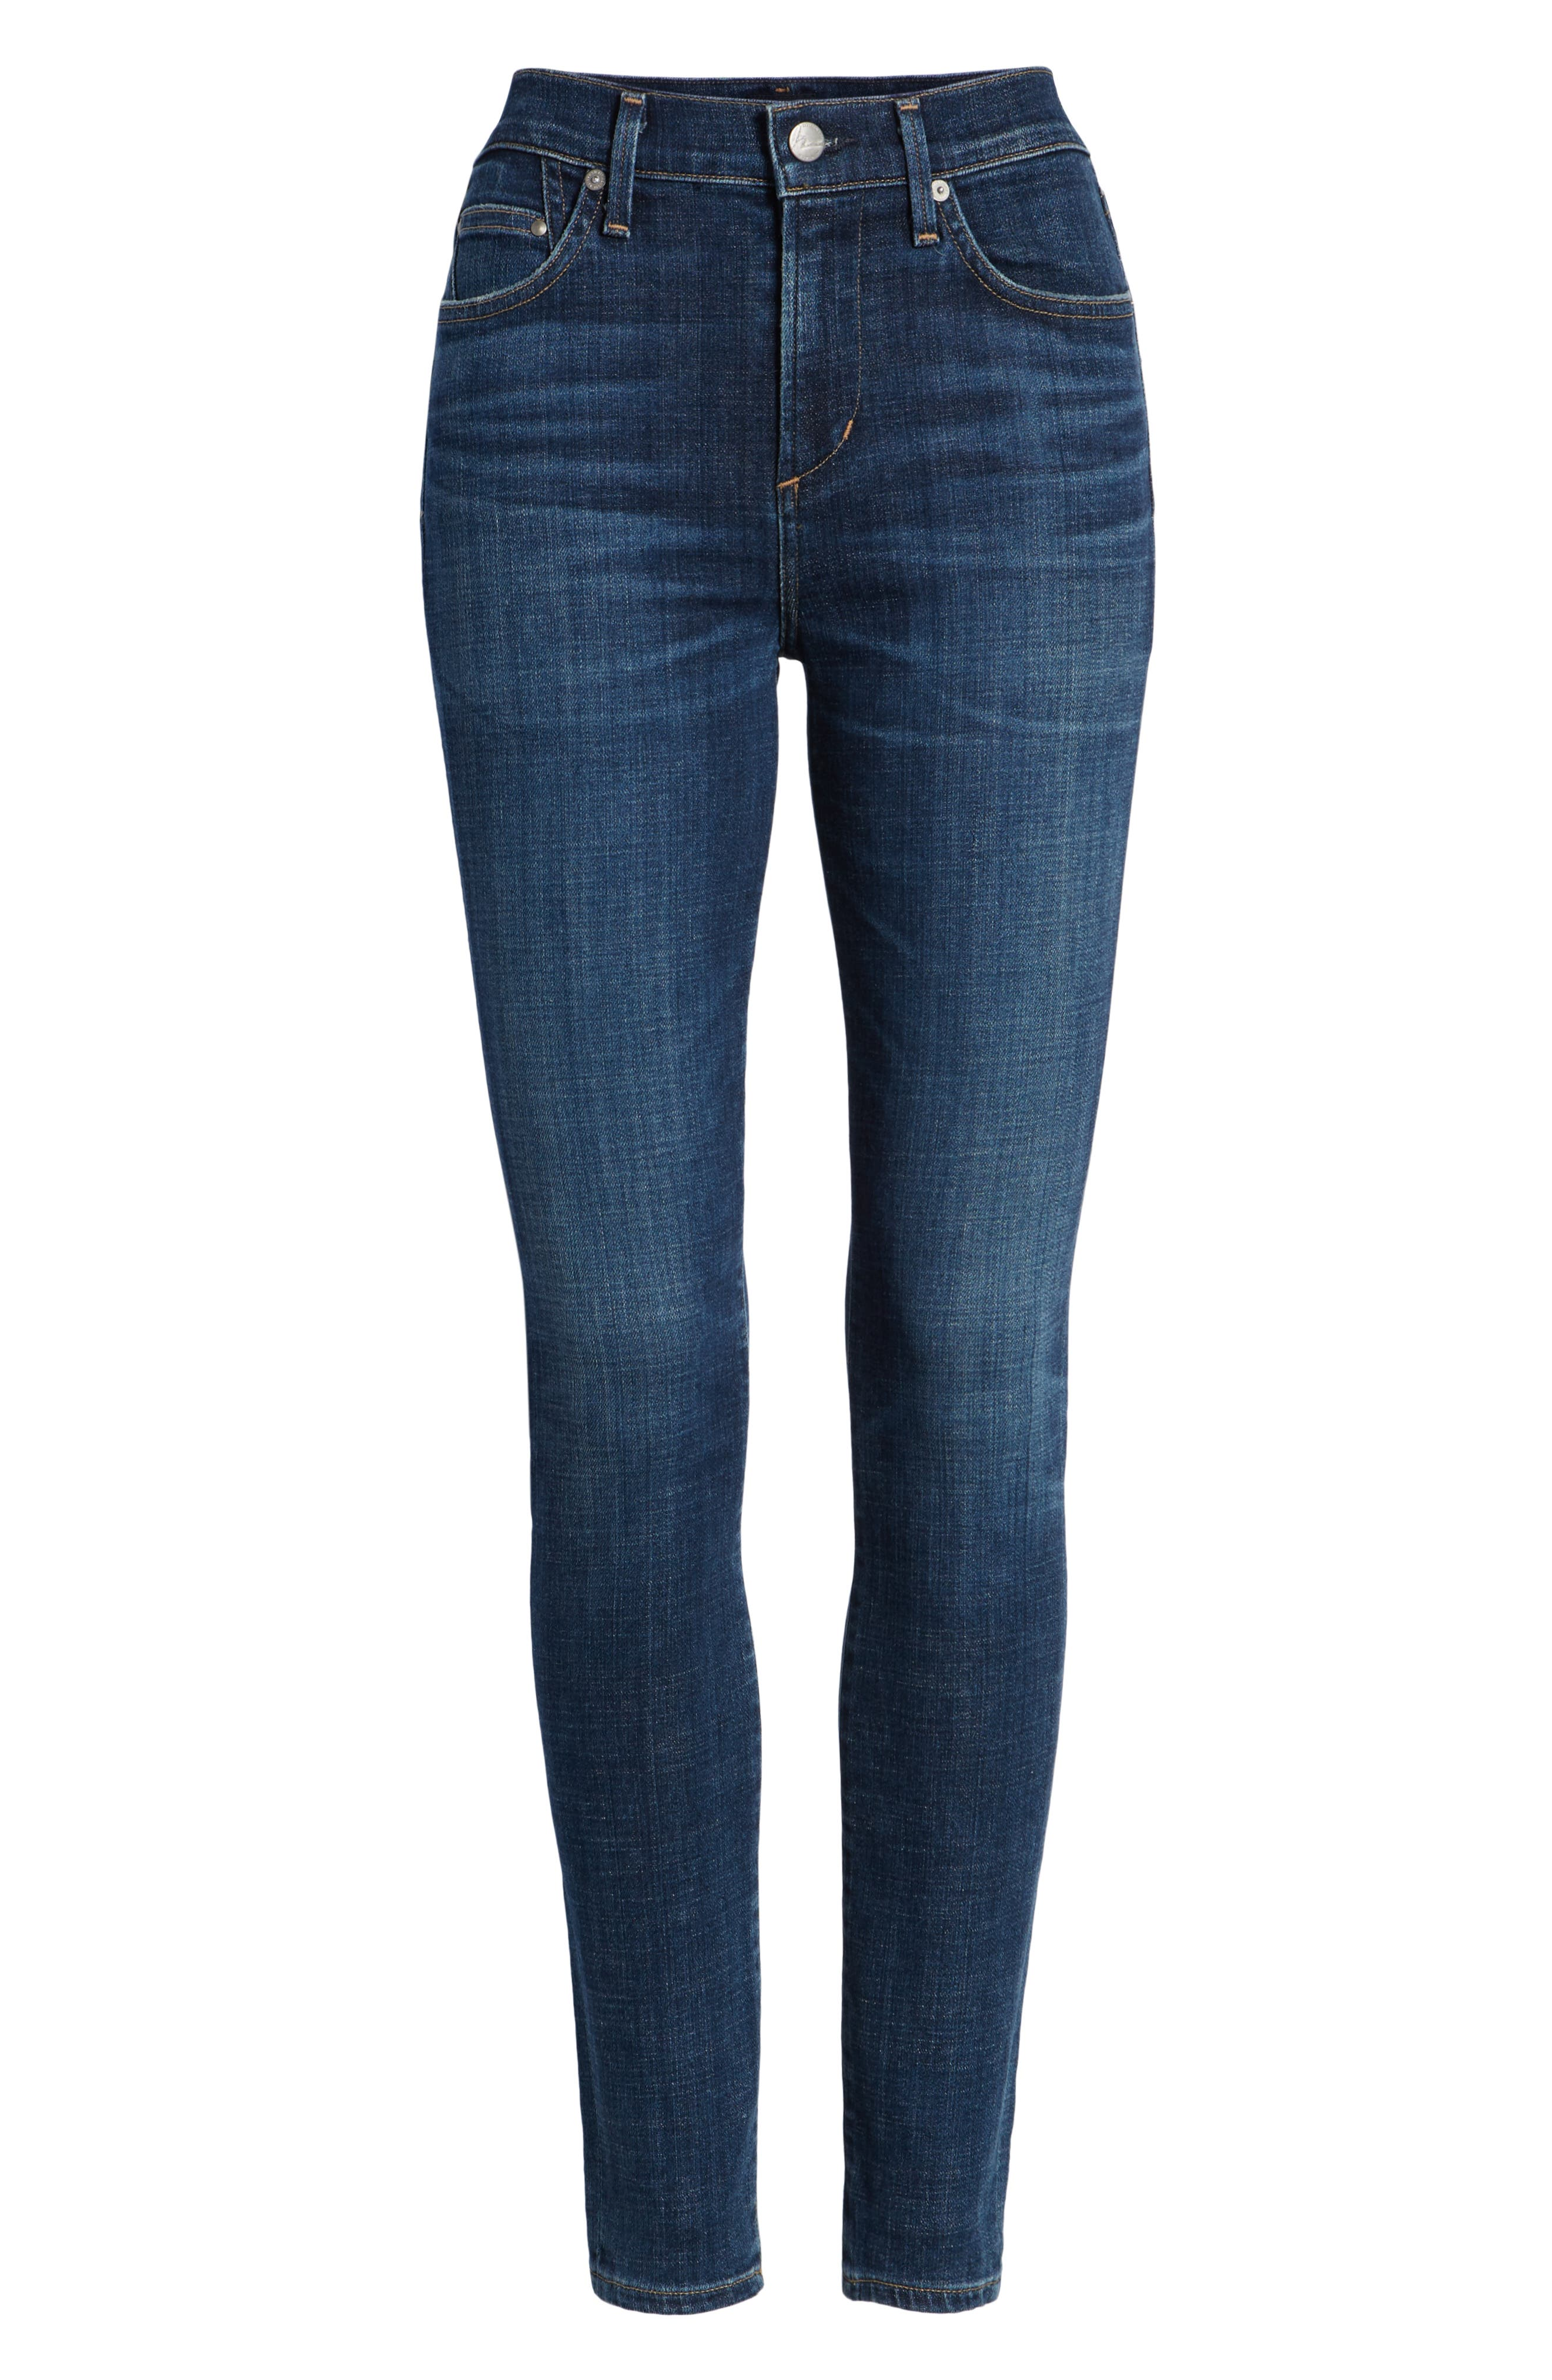 Rocket High Waist Skinny Jeans,                             Alternate thumbnail 7, color,                             428